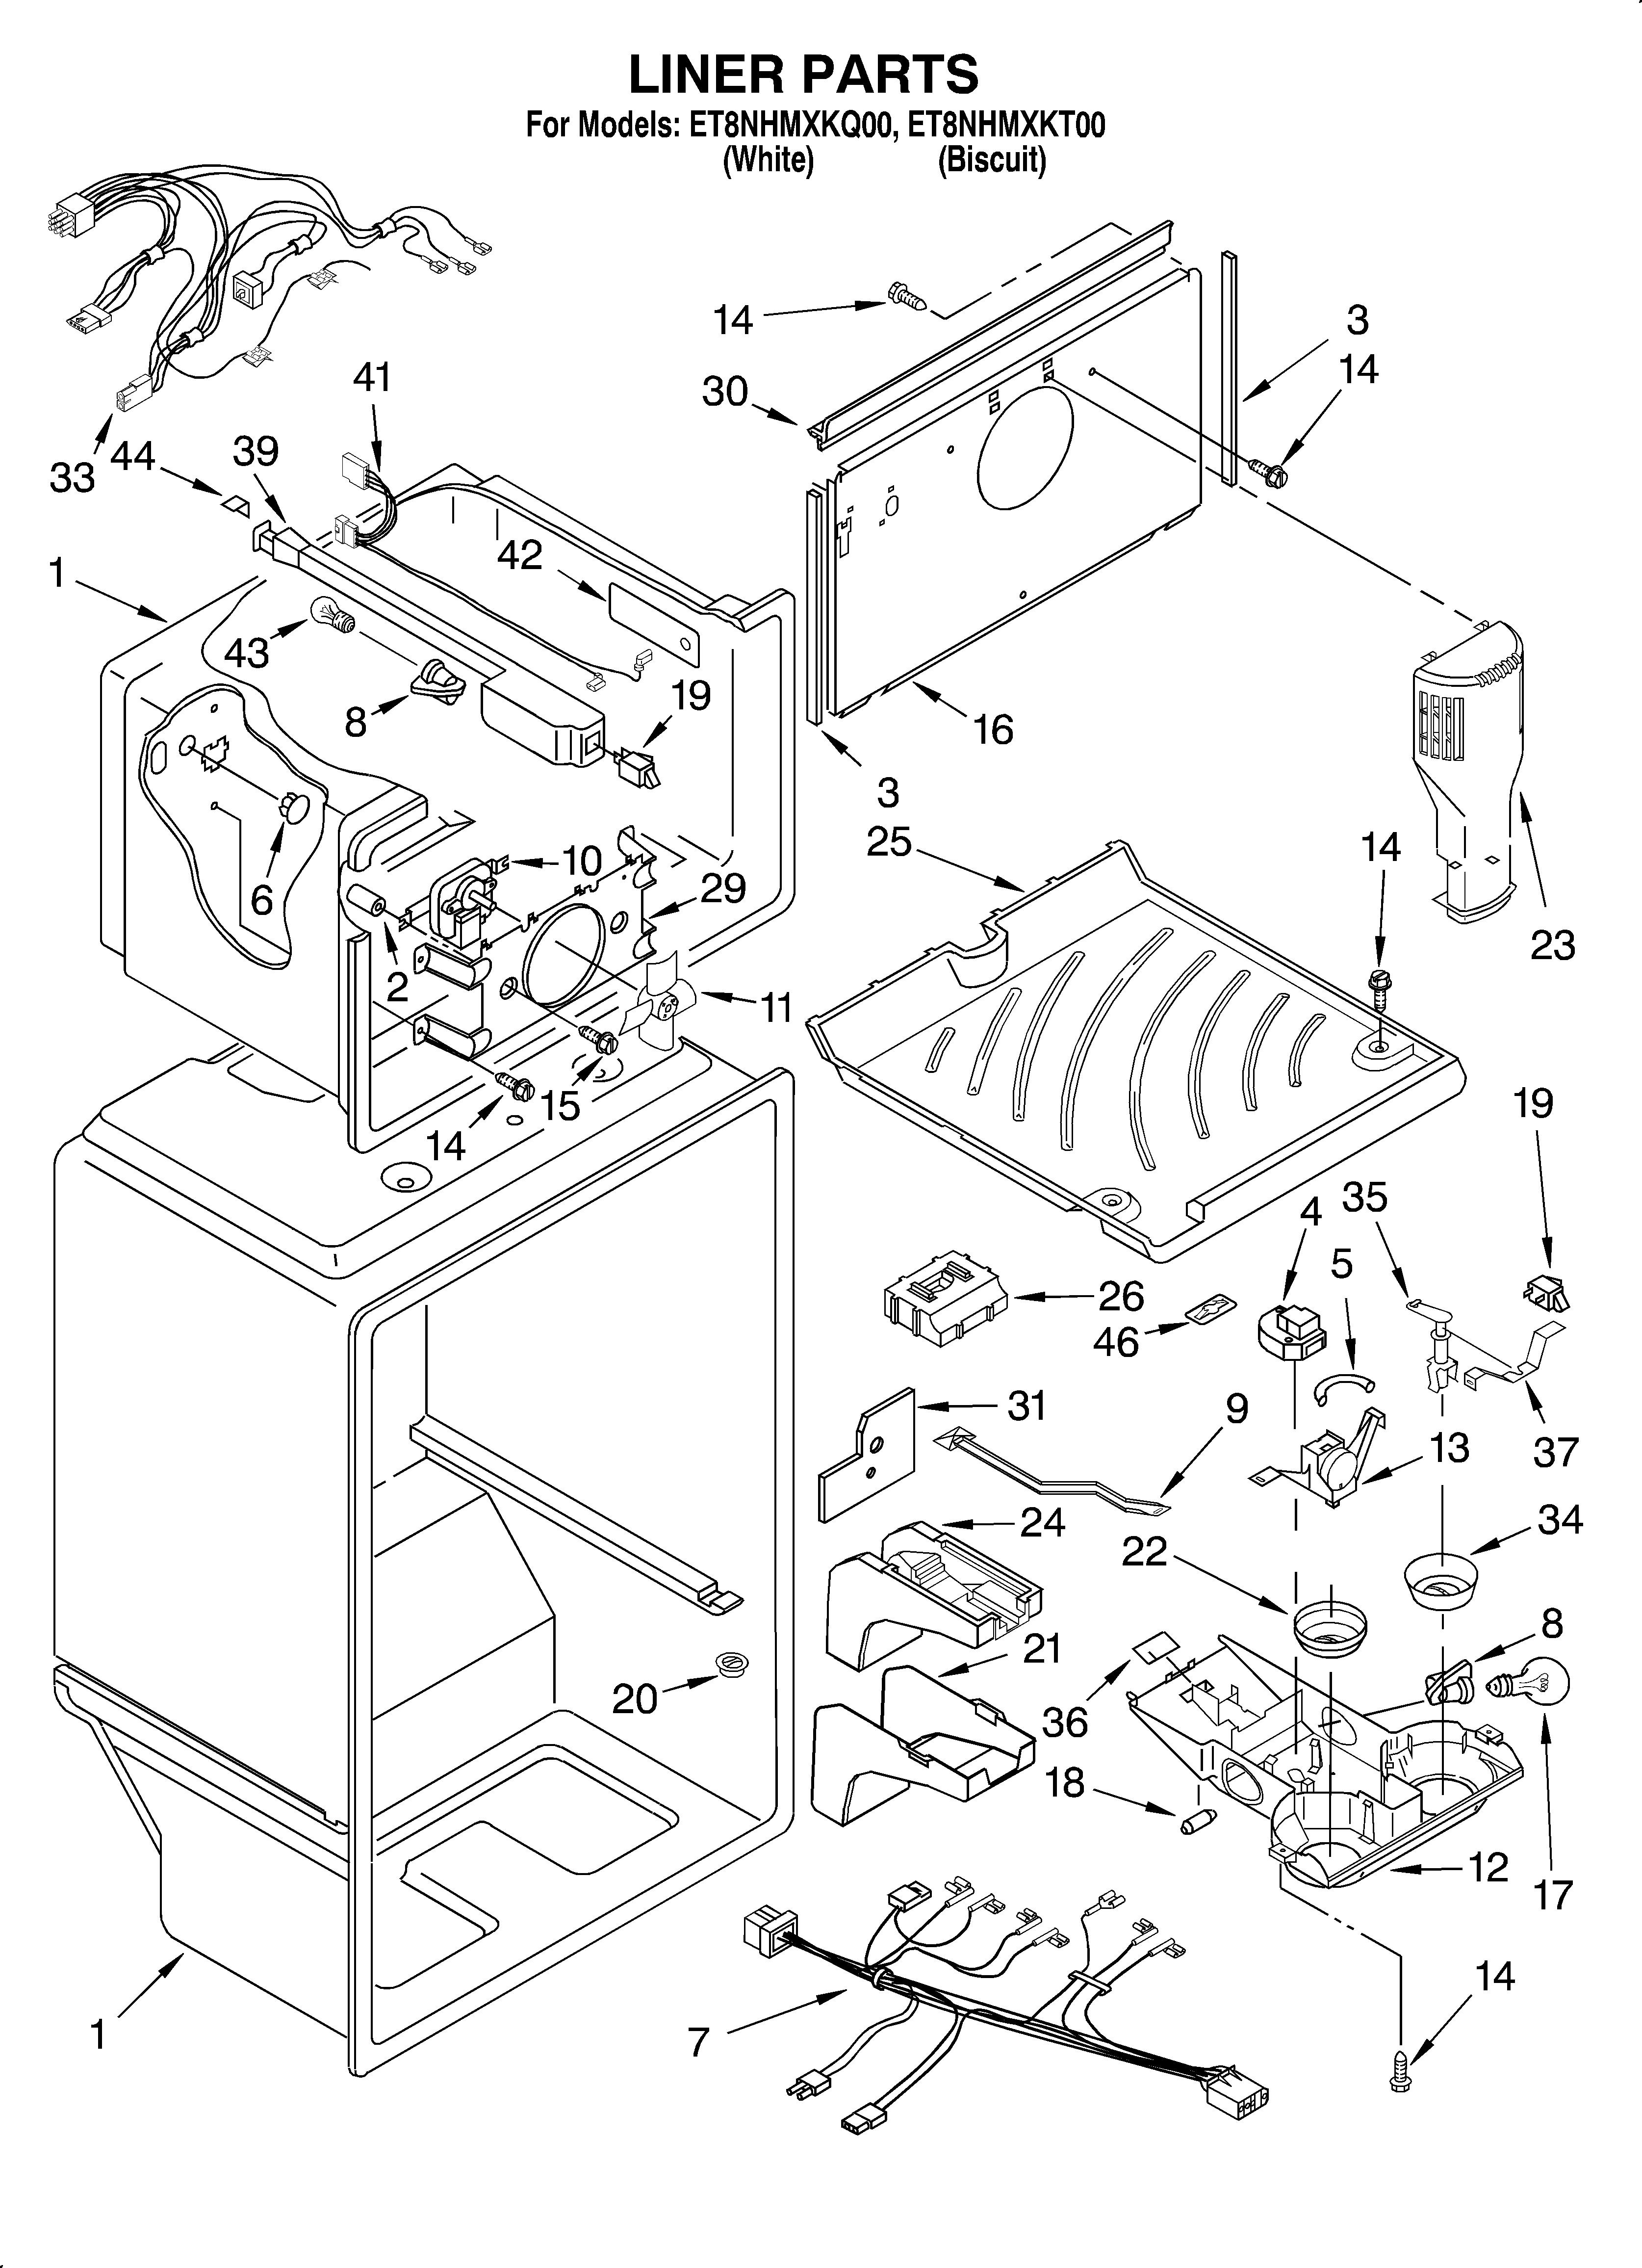 Amana refrigerator parts model abc2037des nissan alternator wiring